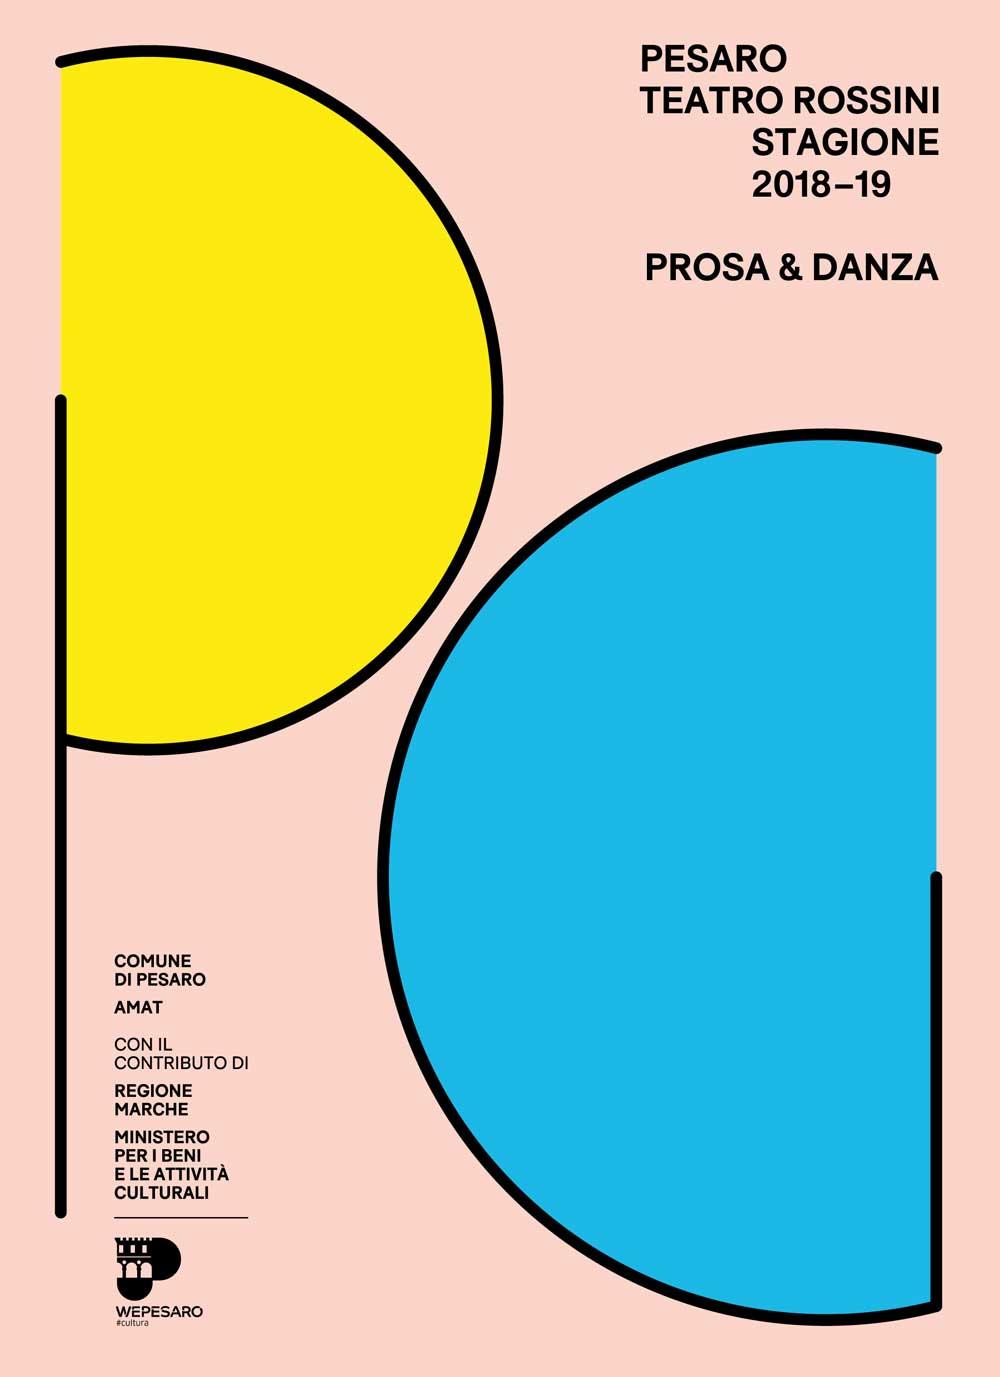 Pesaro 2018-19